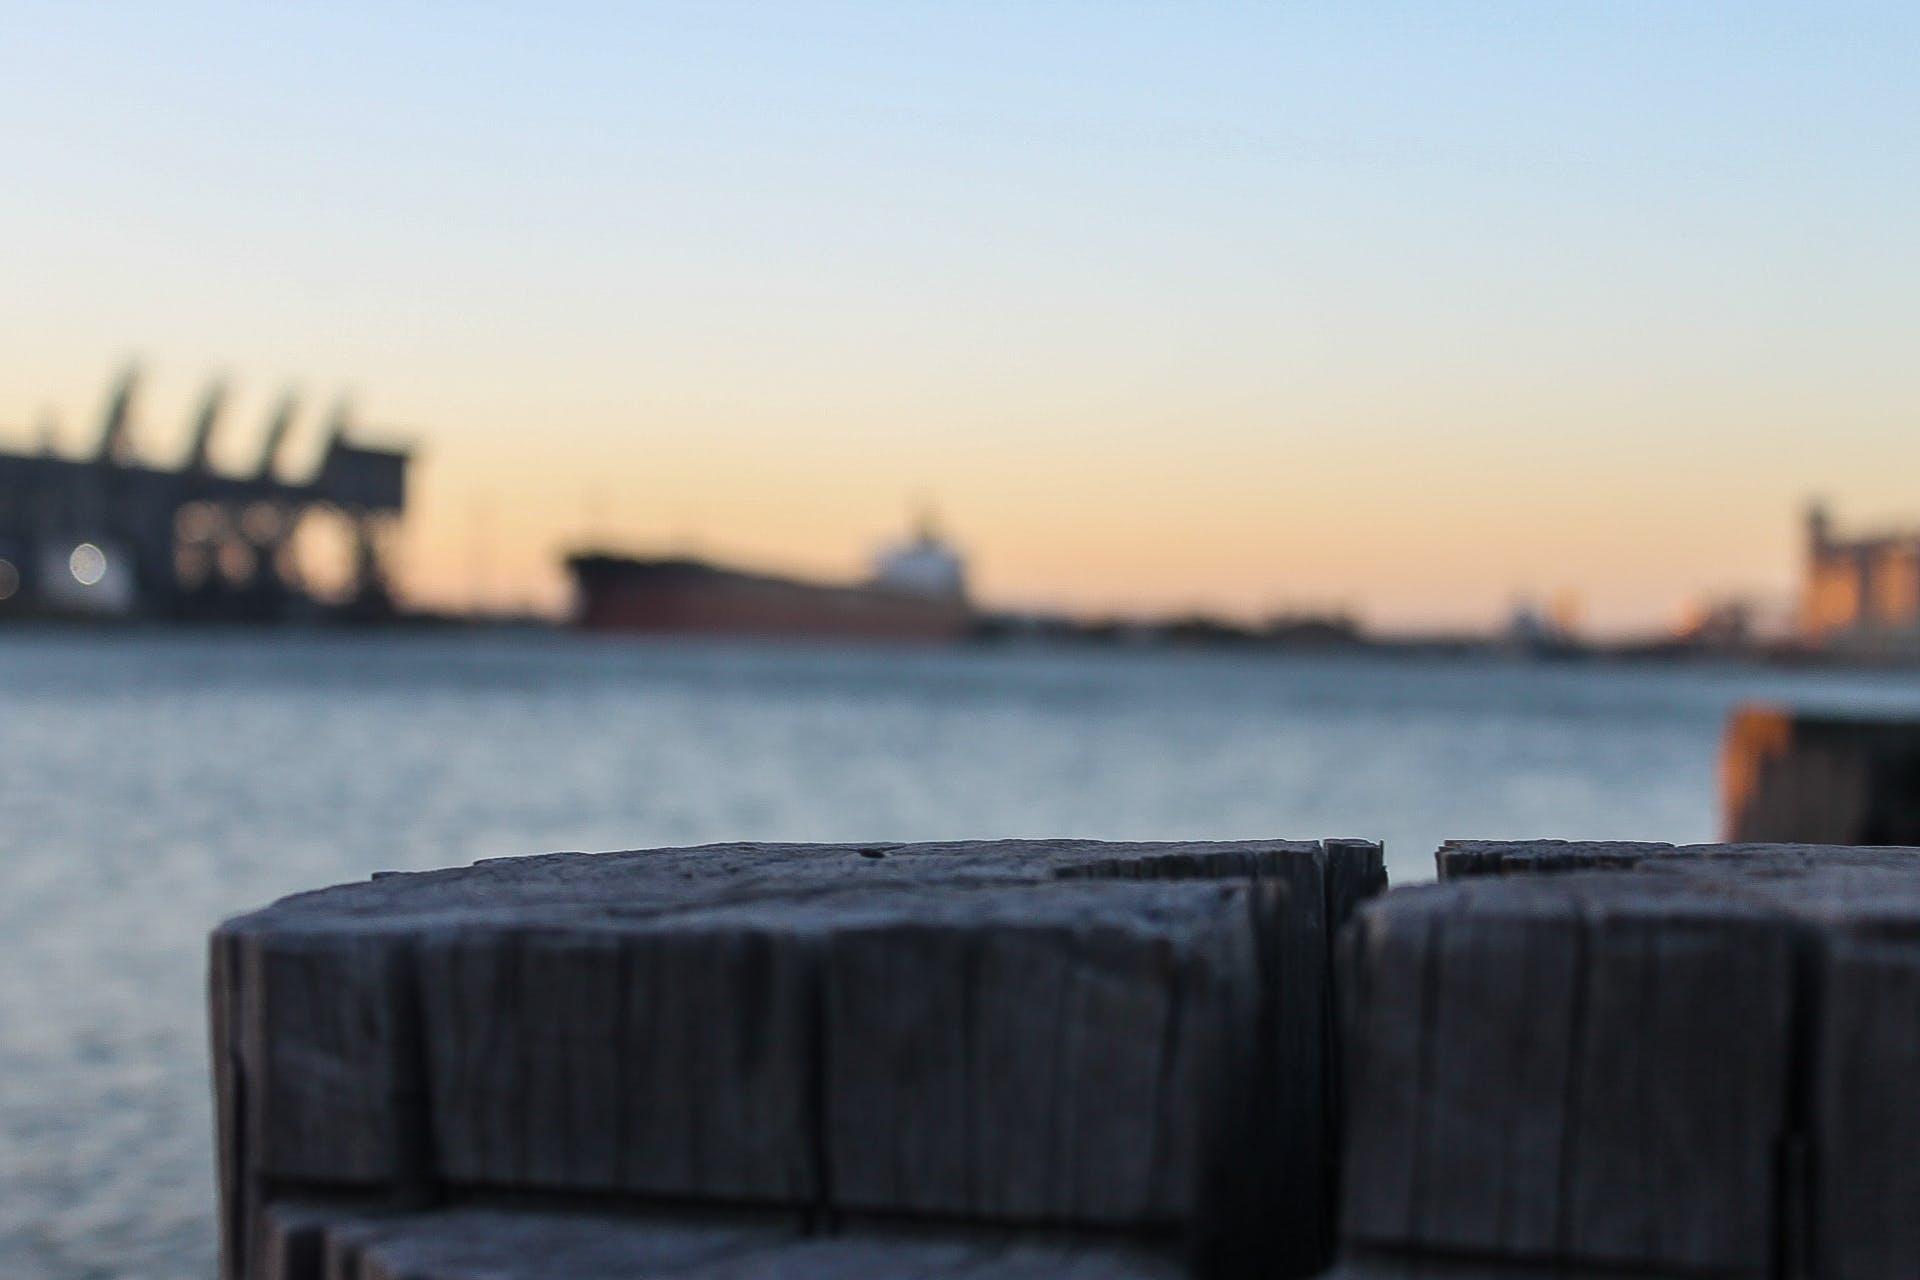 Free stock photo of australia, blur, blurred background, cargo ship